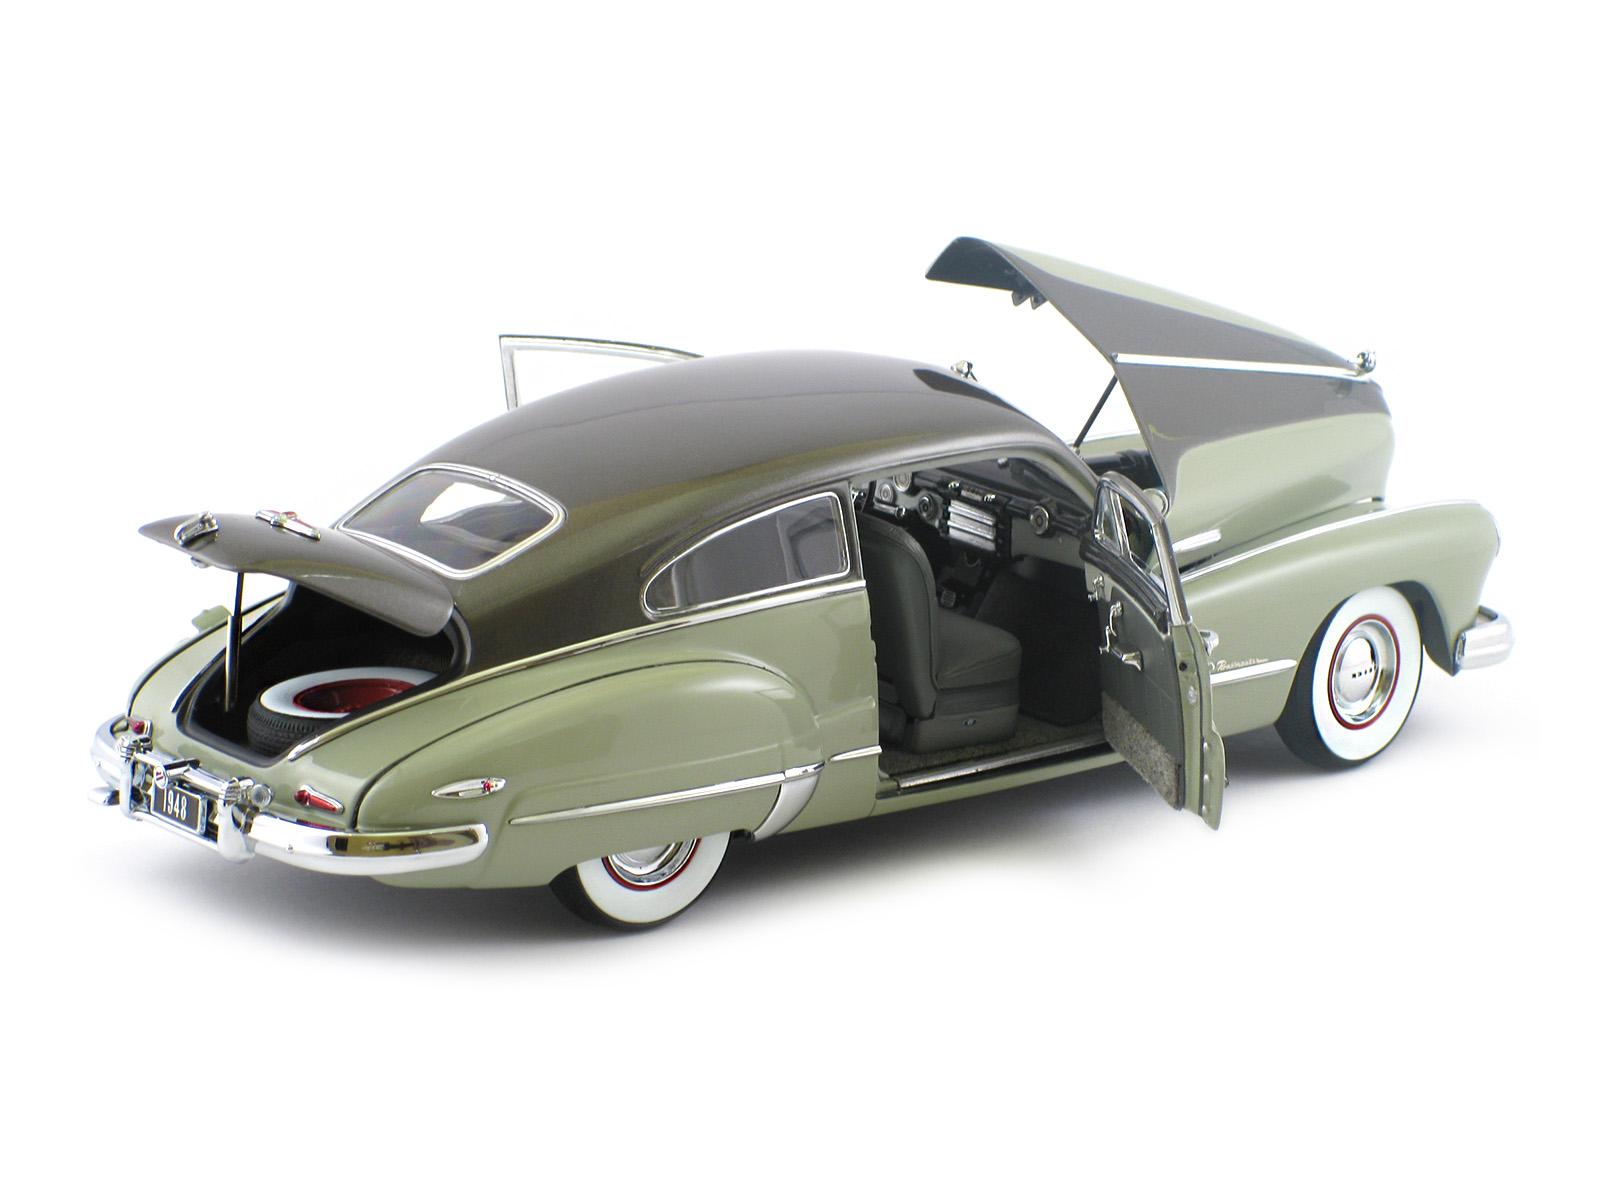 1948 Buick Roadmaster Coupe Danbury Mint